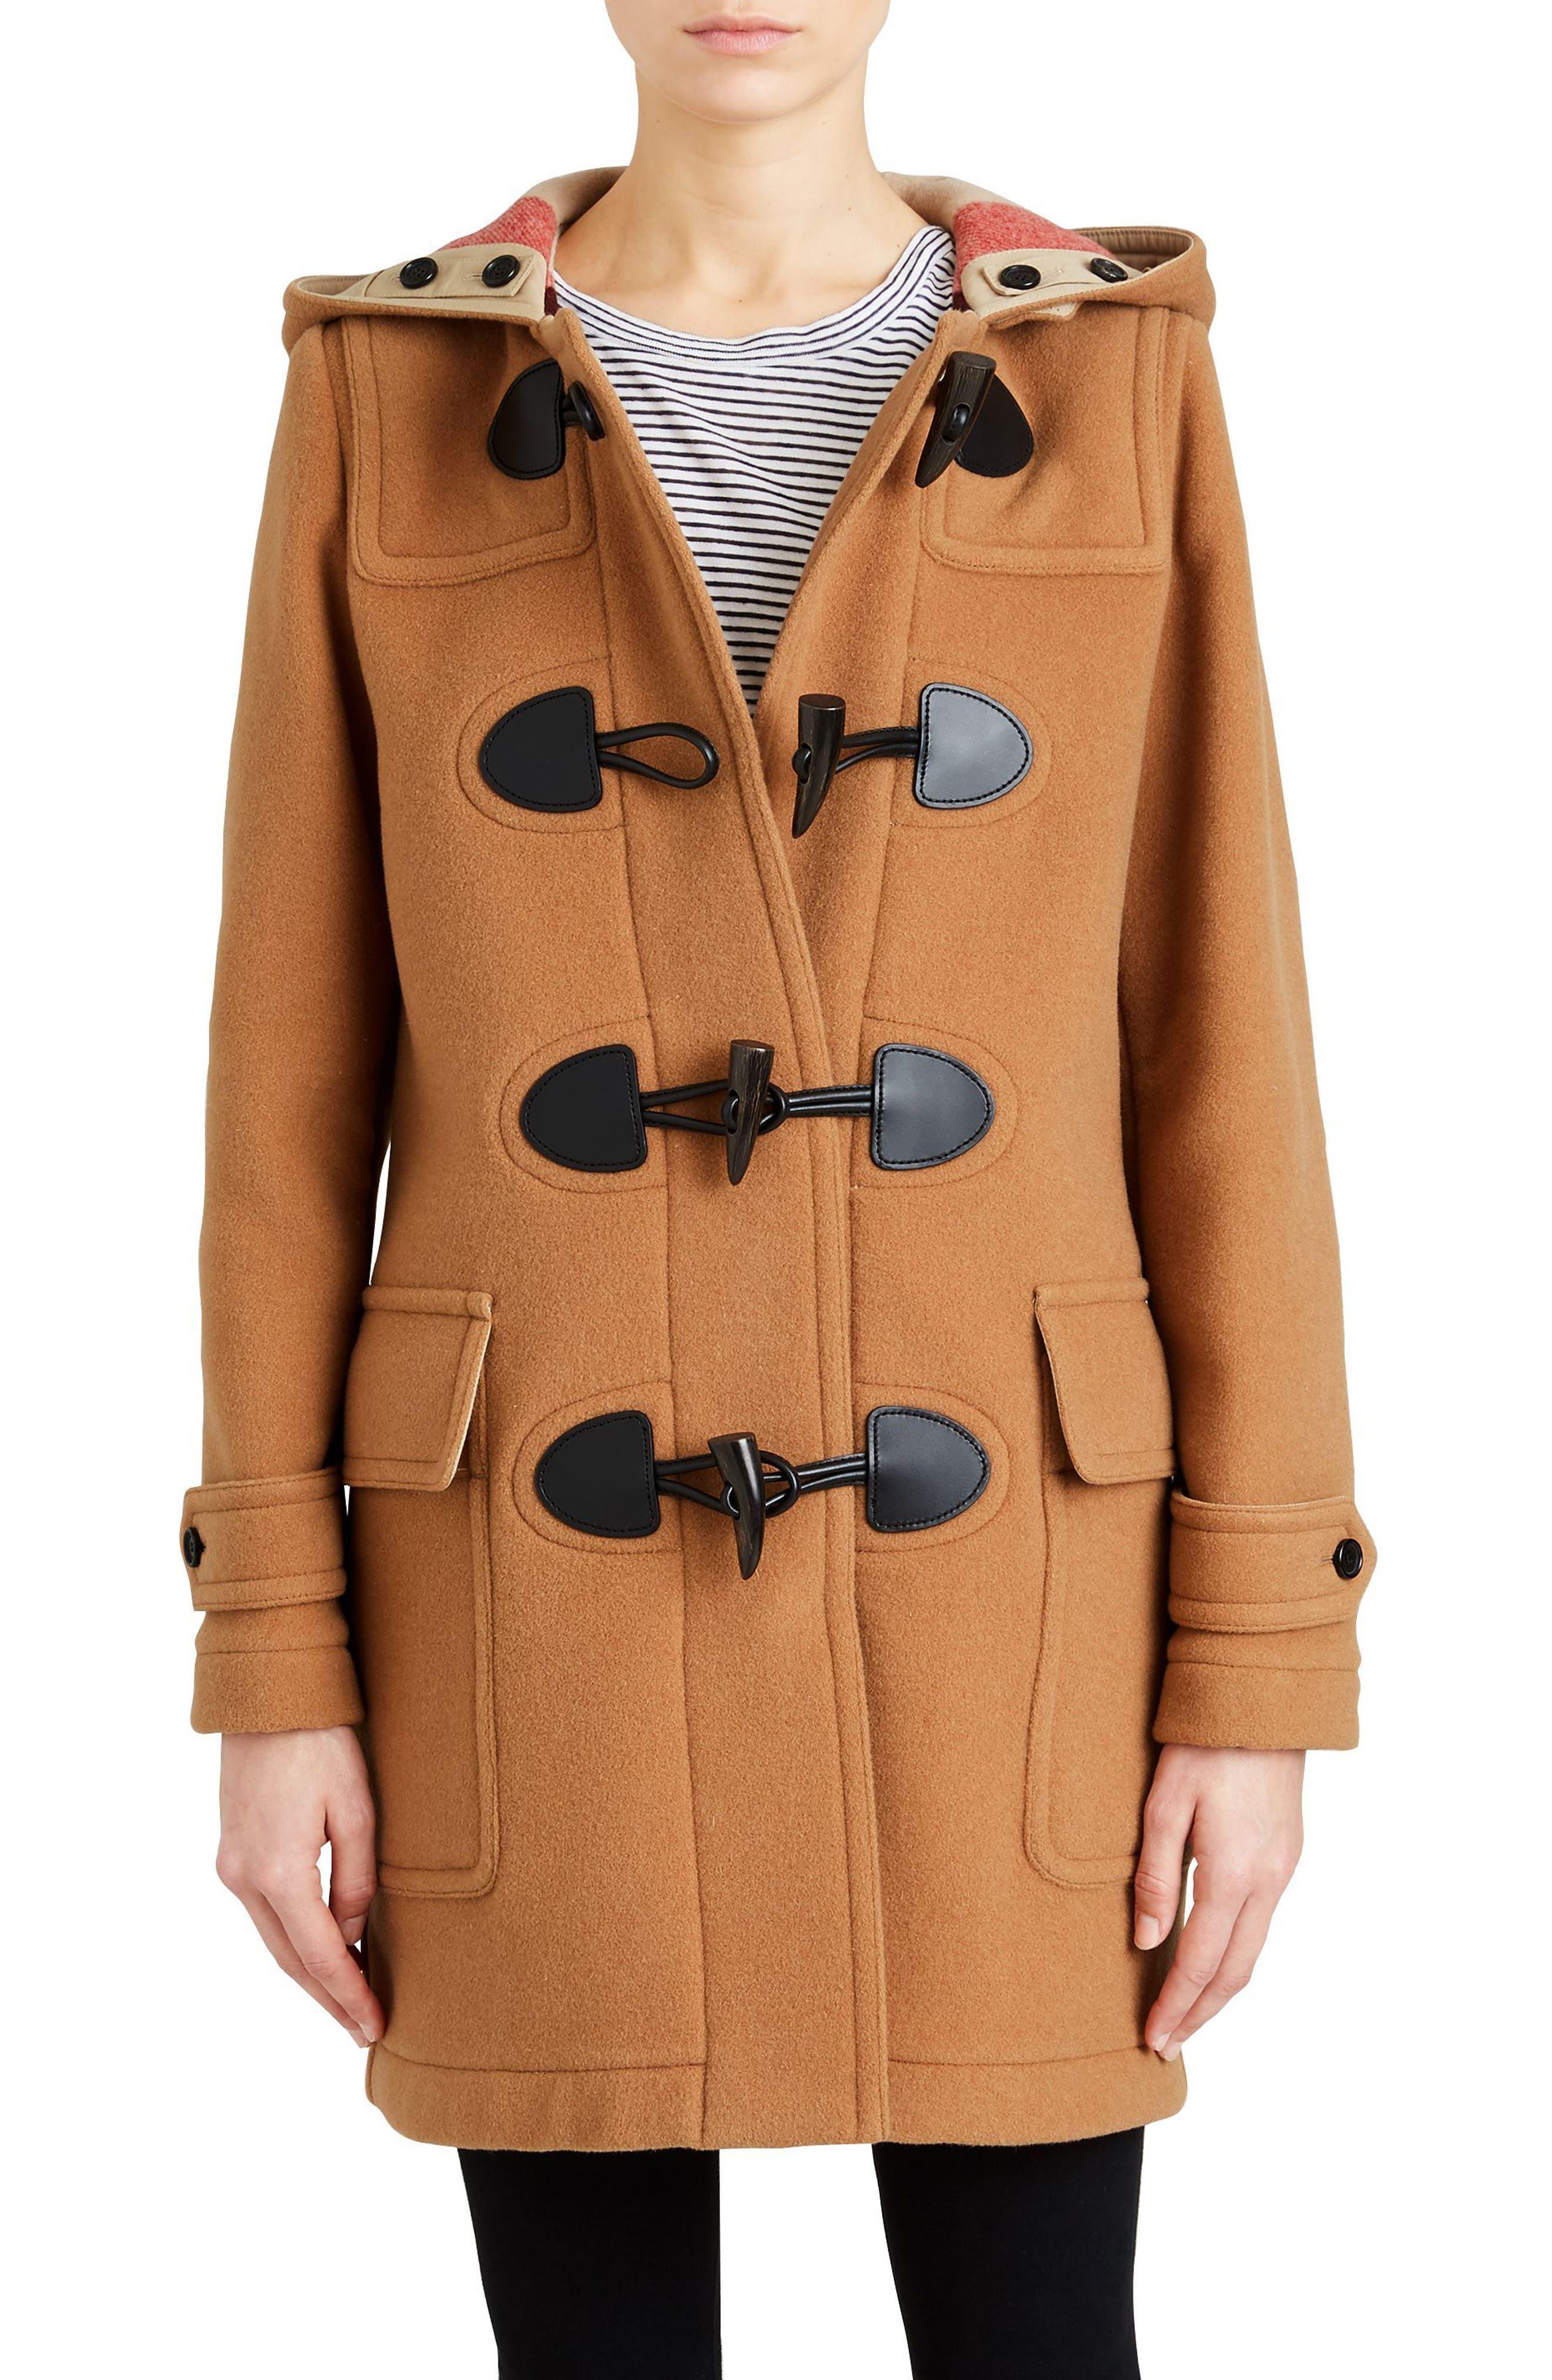 Mersey Wool Blend Duffle Coat,                             Main thumbnail 1, color,                             Mid Camel